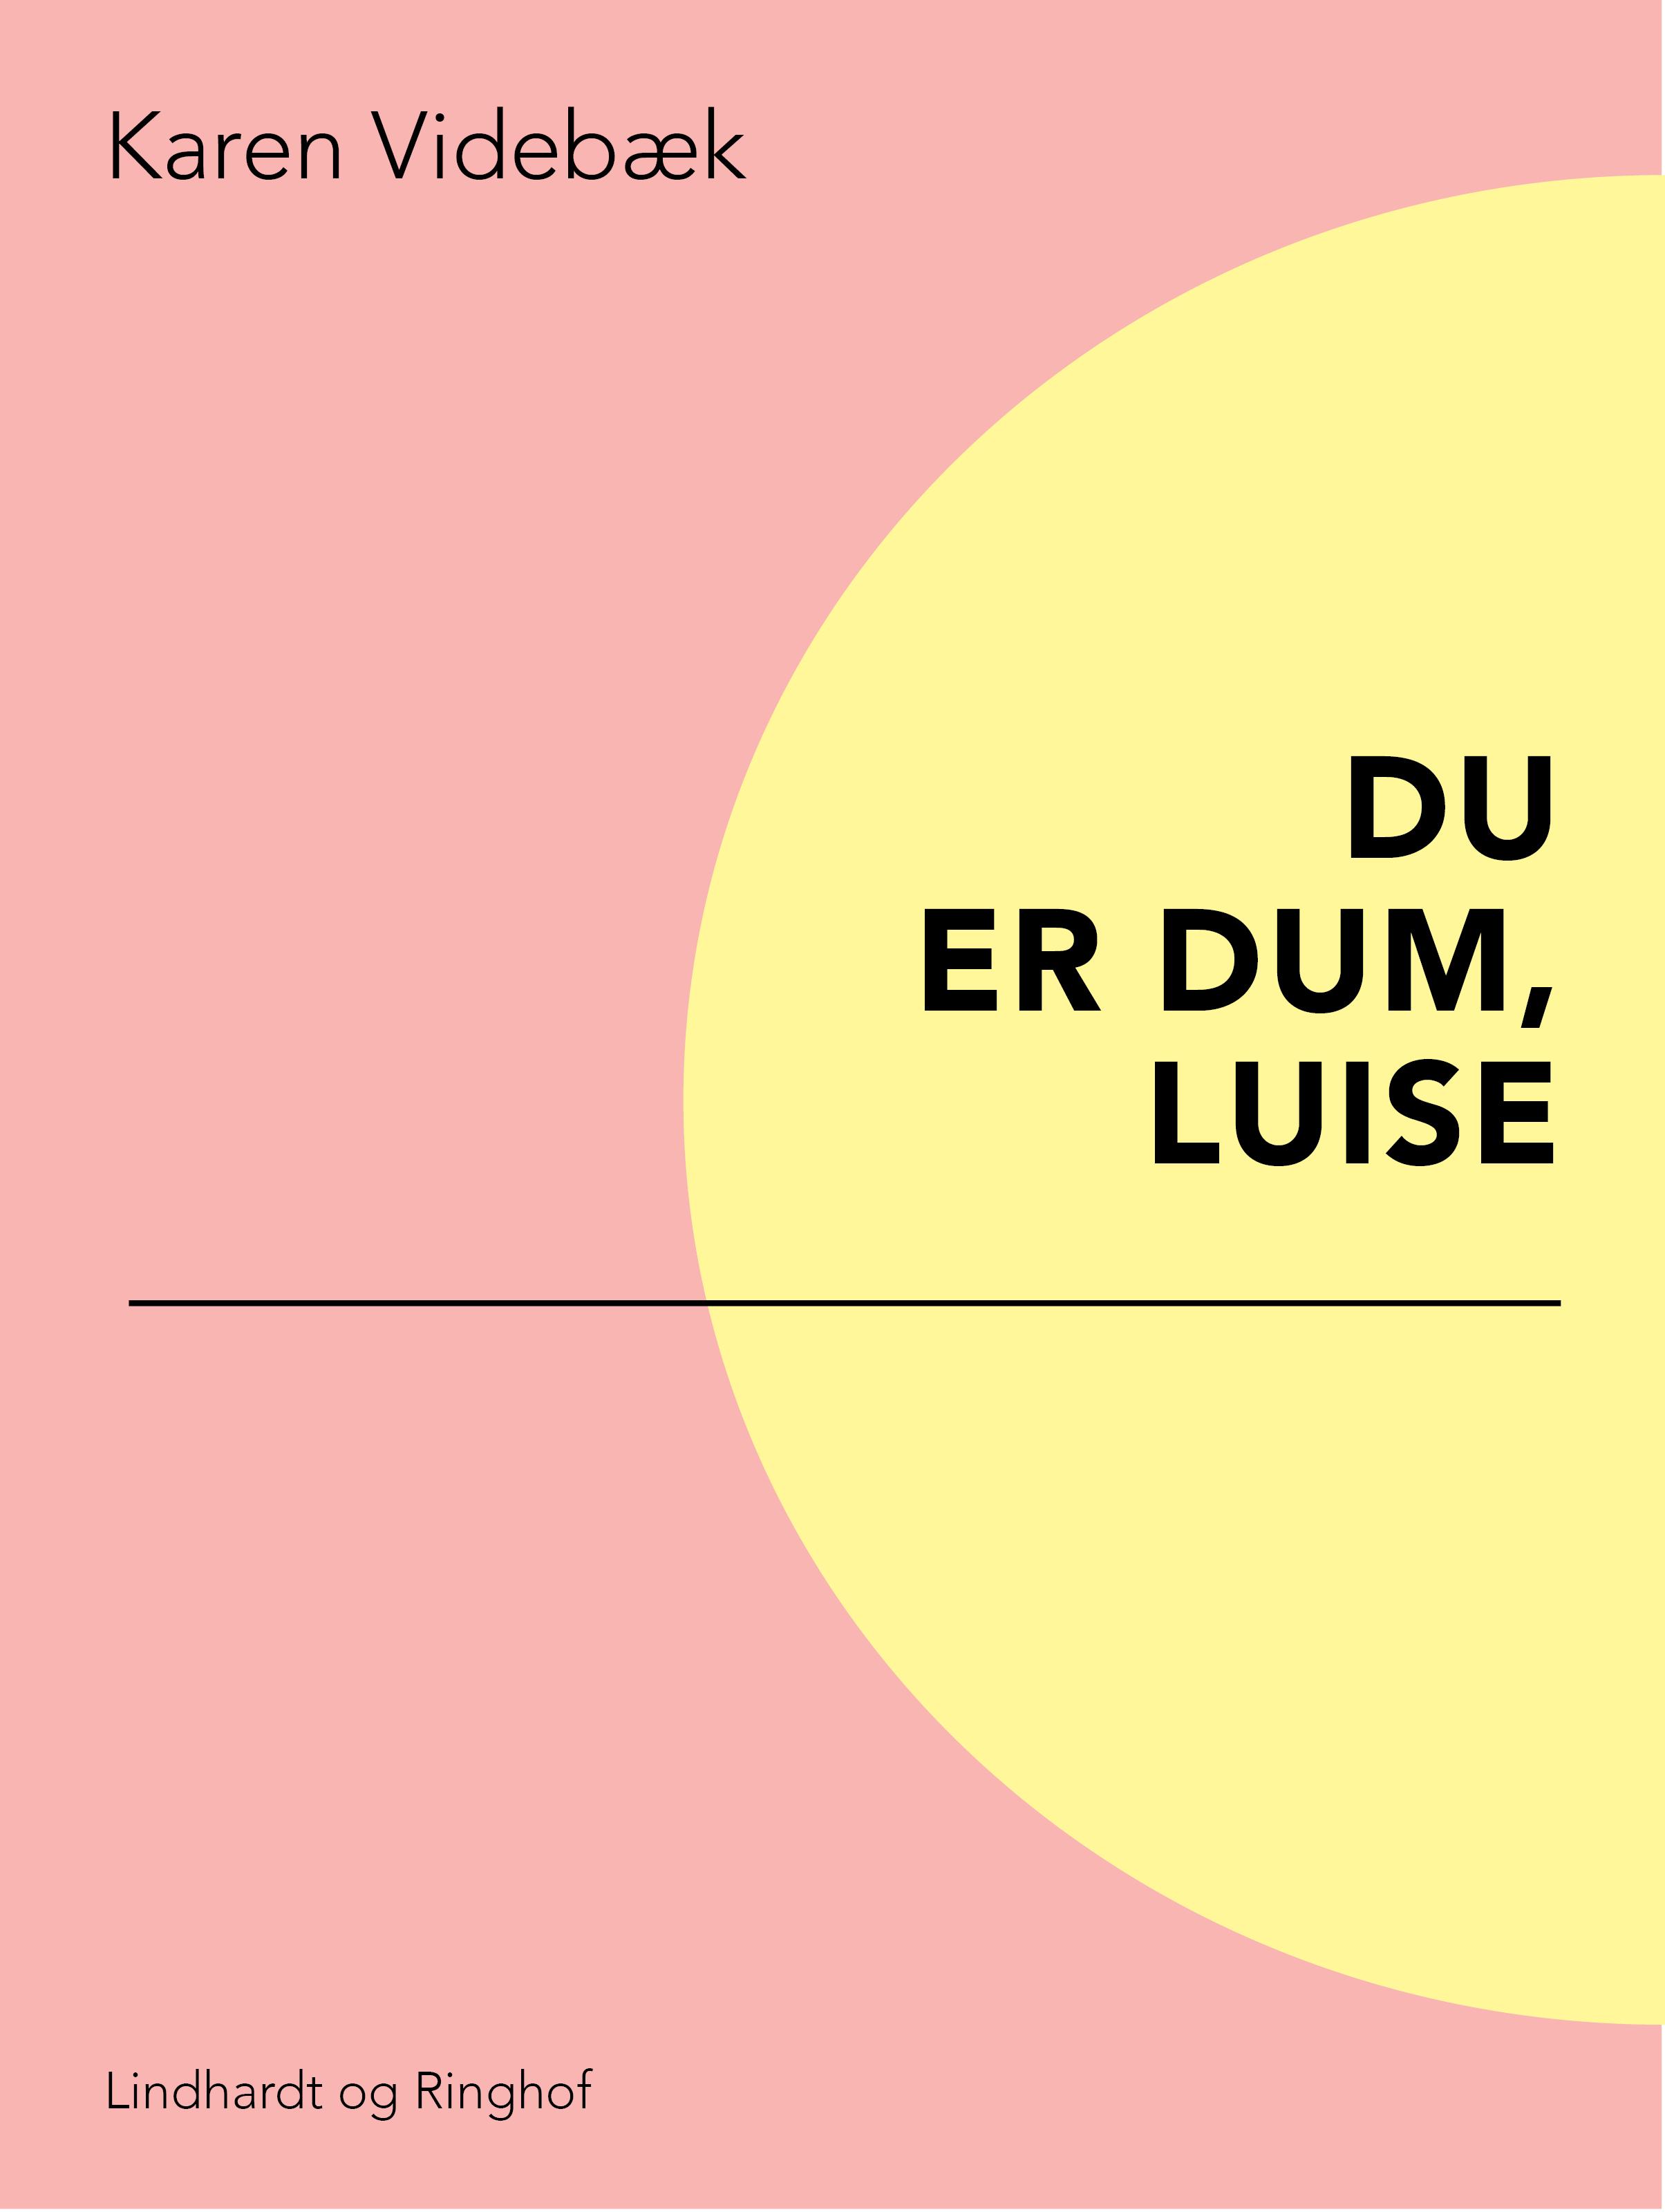 Du er dum, Luise - Karen Videbæk - Bøger - Saga - 9788726004953 - 25. maj 2018